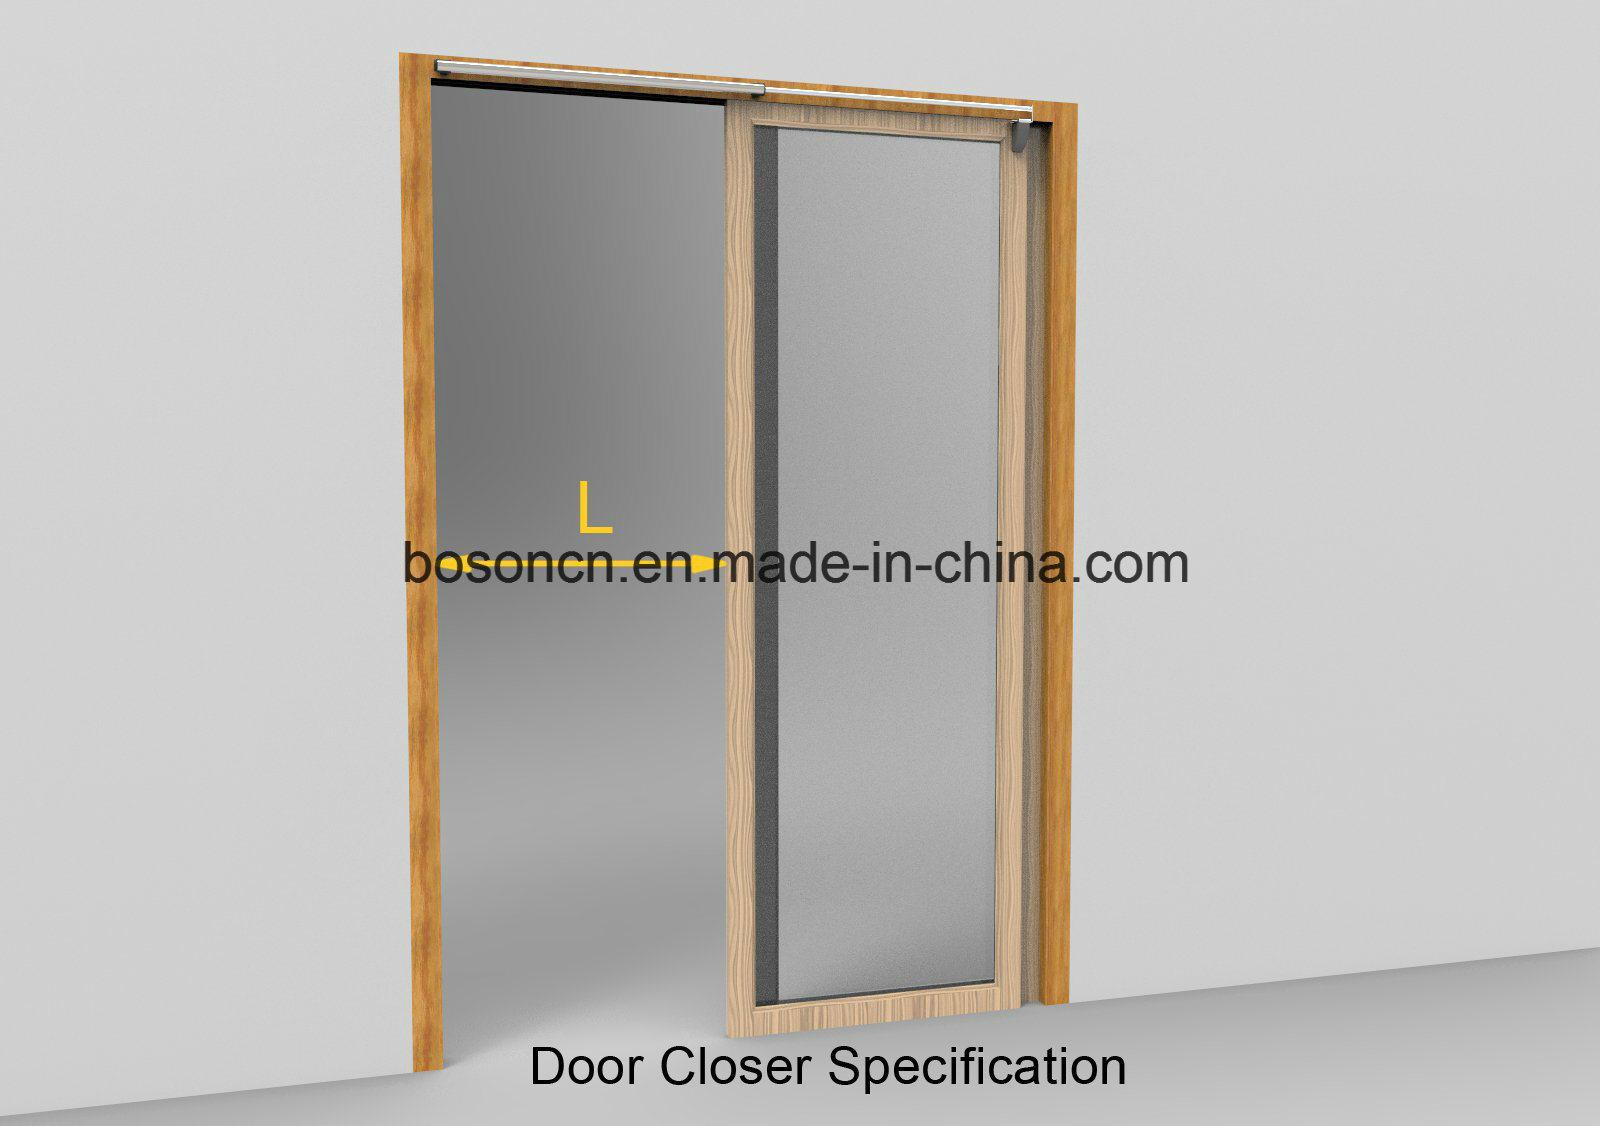 China Semi Automatic Cabinet Cupboard Chest Sliding Door Closer